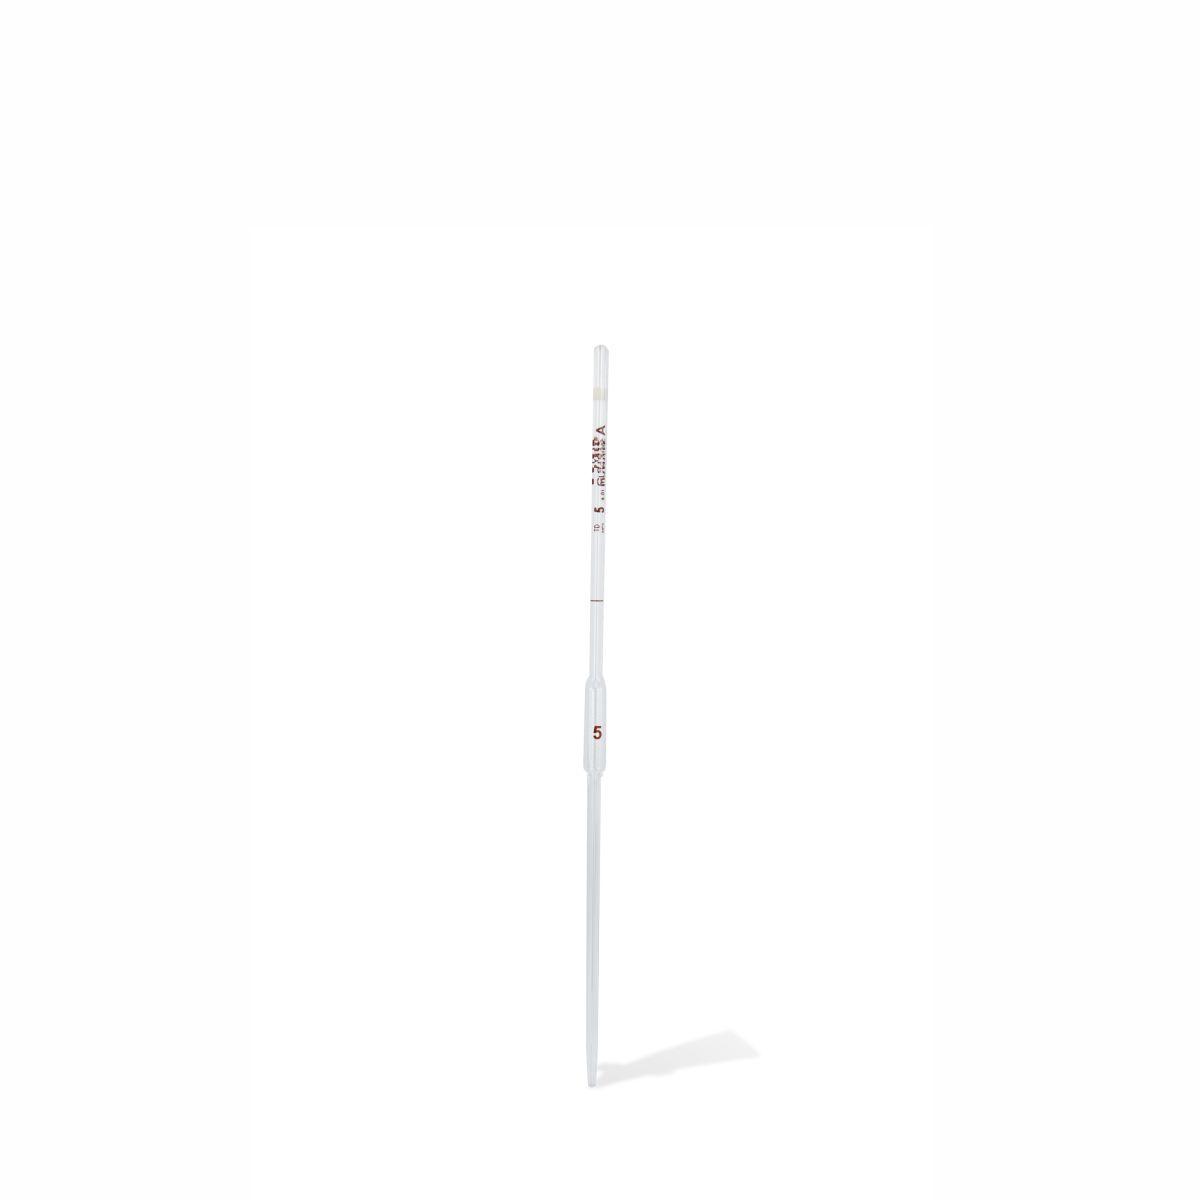 Pipeta Volumétrica 5 mL